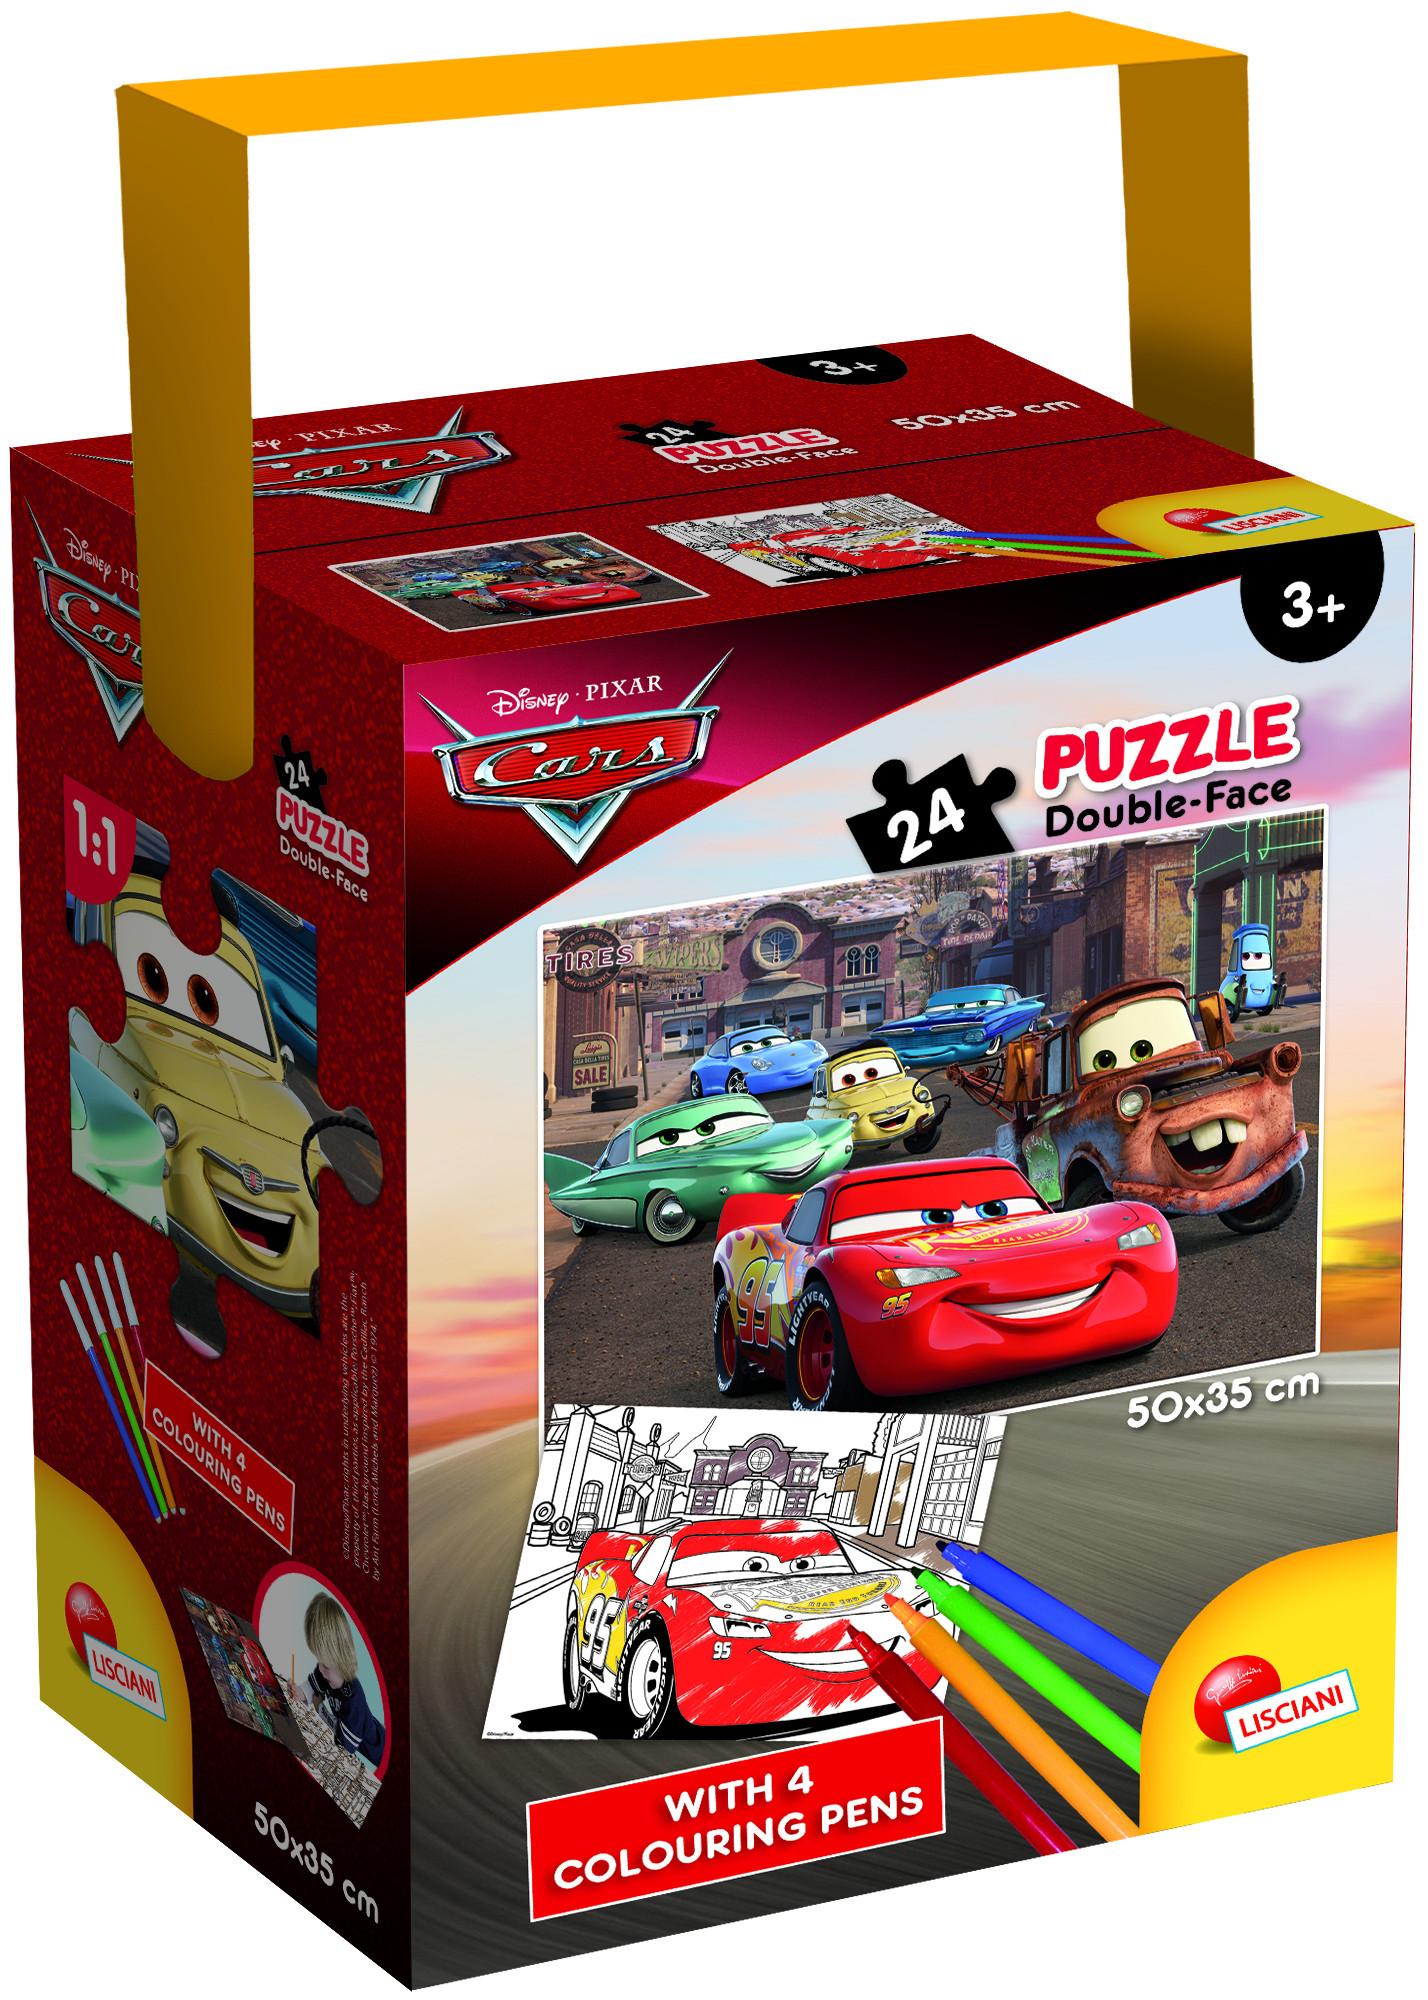 PUZZLE IN A TUB MINI 48 35X50 24 PEZZI CARS 3 (65257)